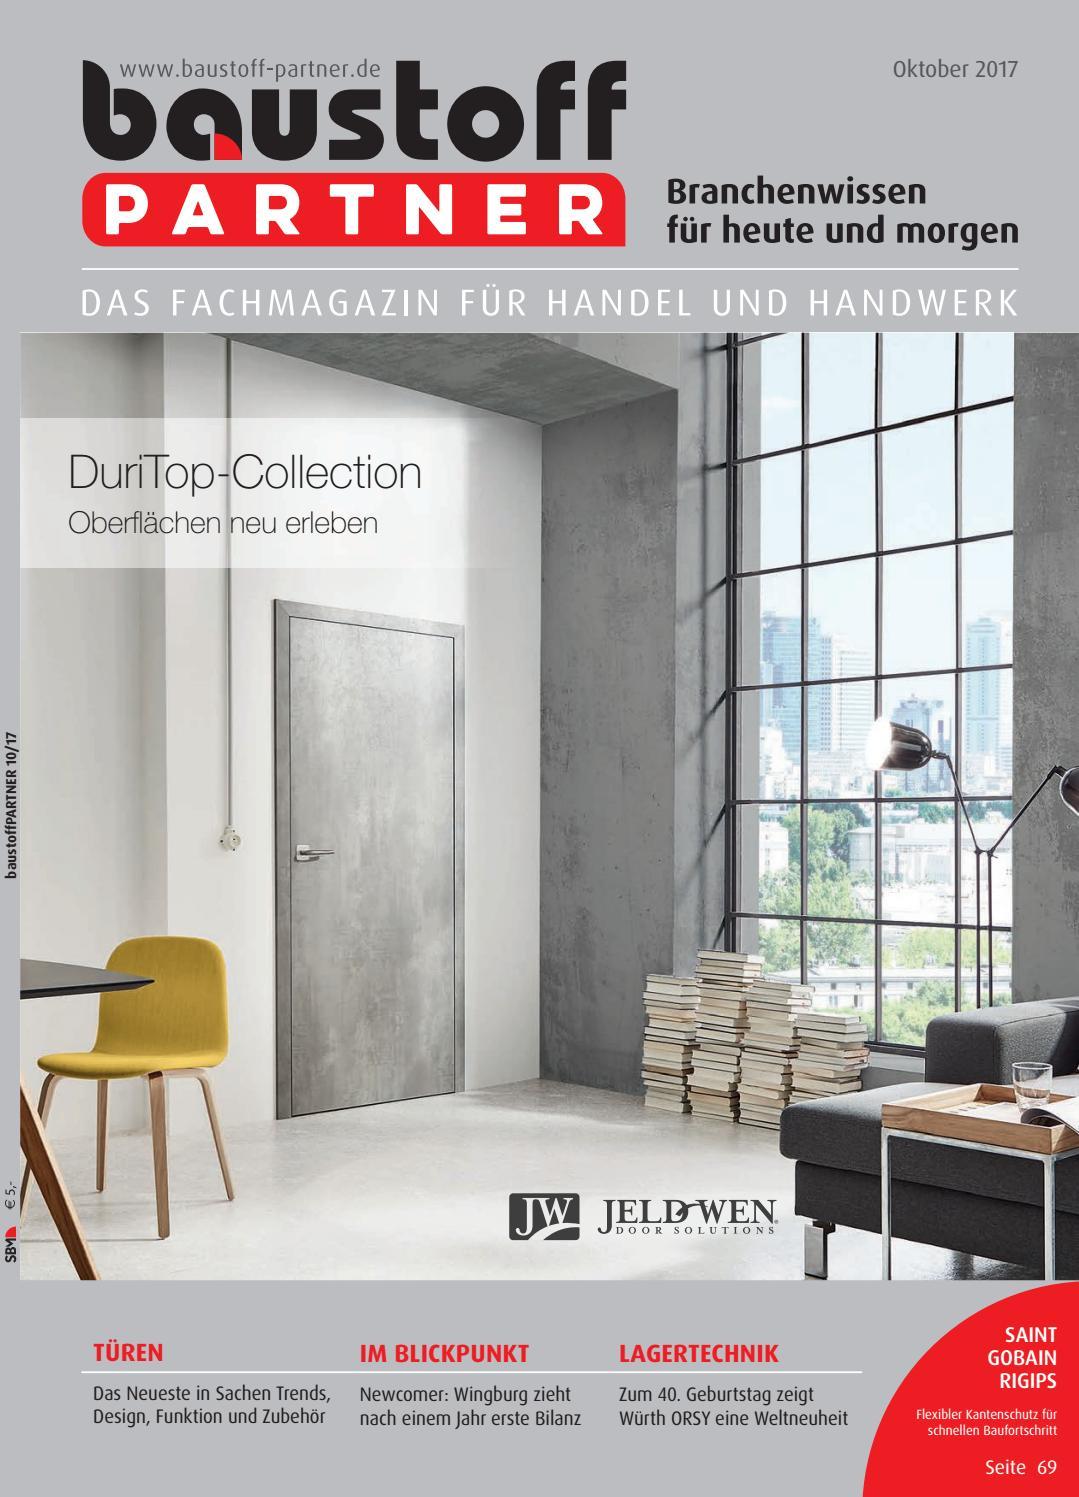 baustoffPARTNER Oktober 2017 by SBM Verlag GmbH - issuu